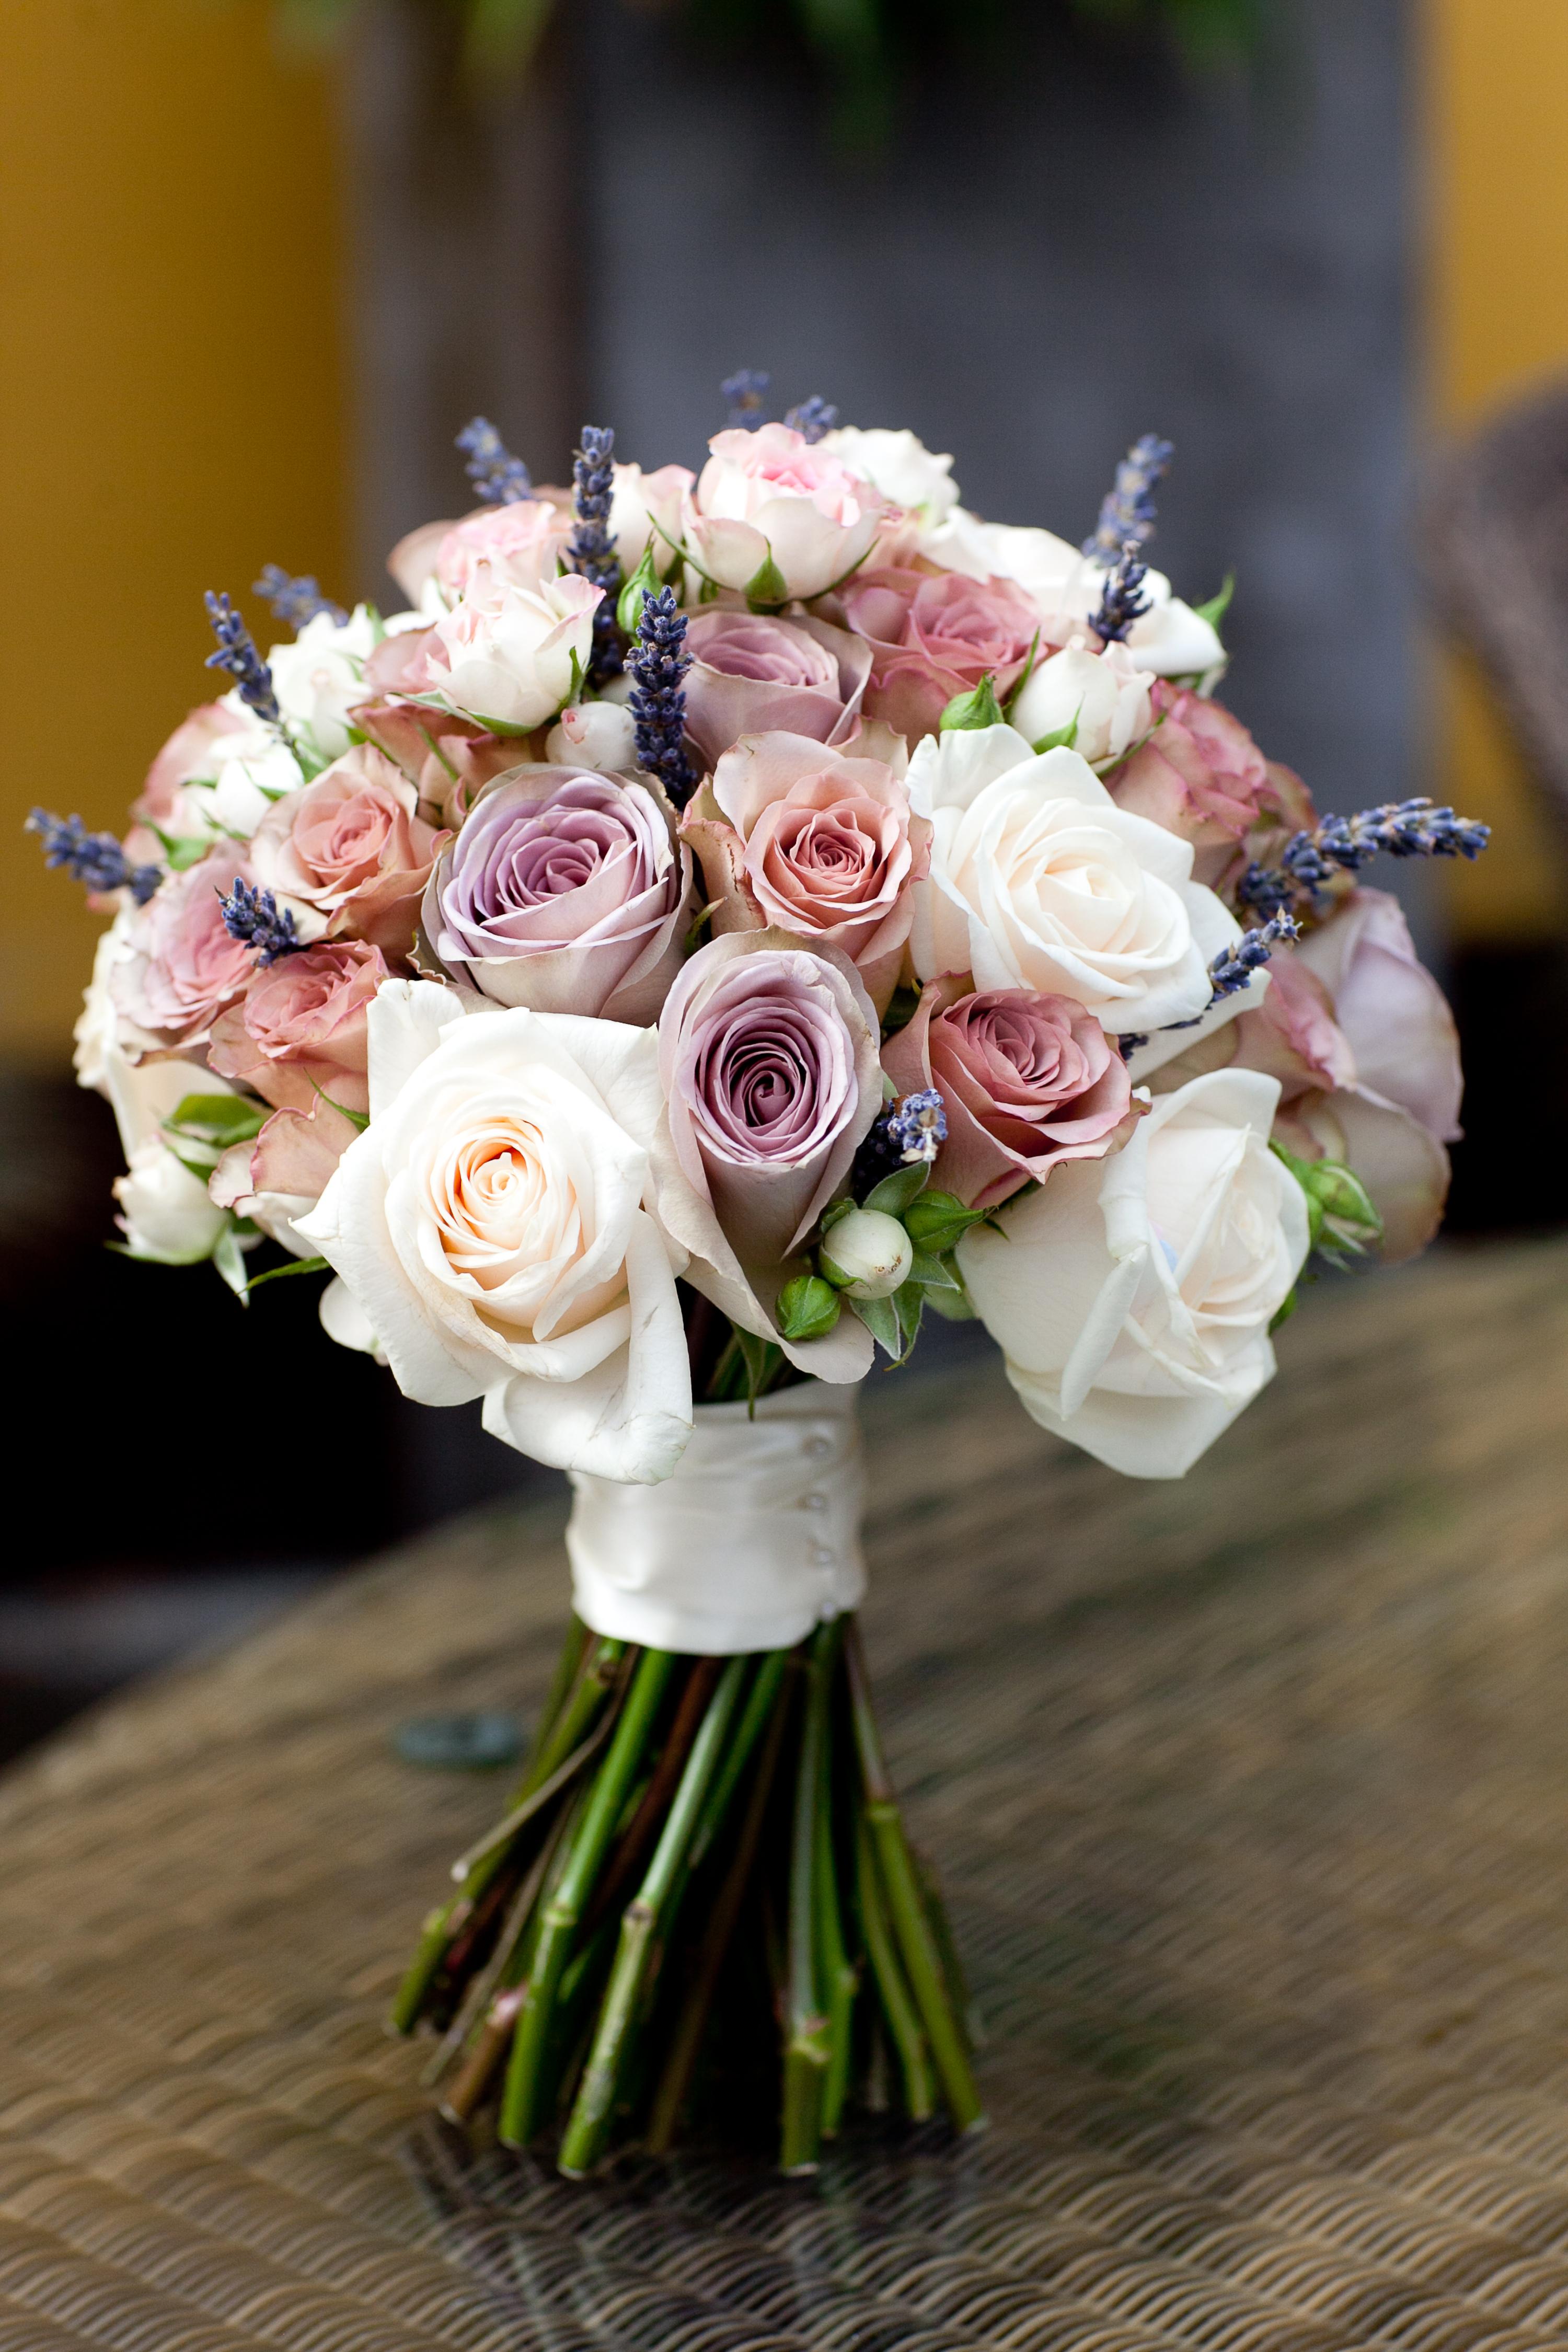 Wedding Flowers In Cornwall : Wedding flowers cornwall and devon bj richards